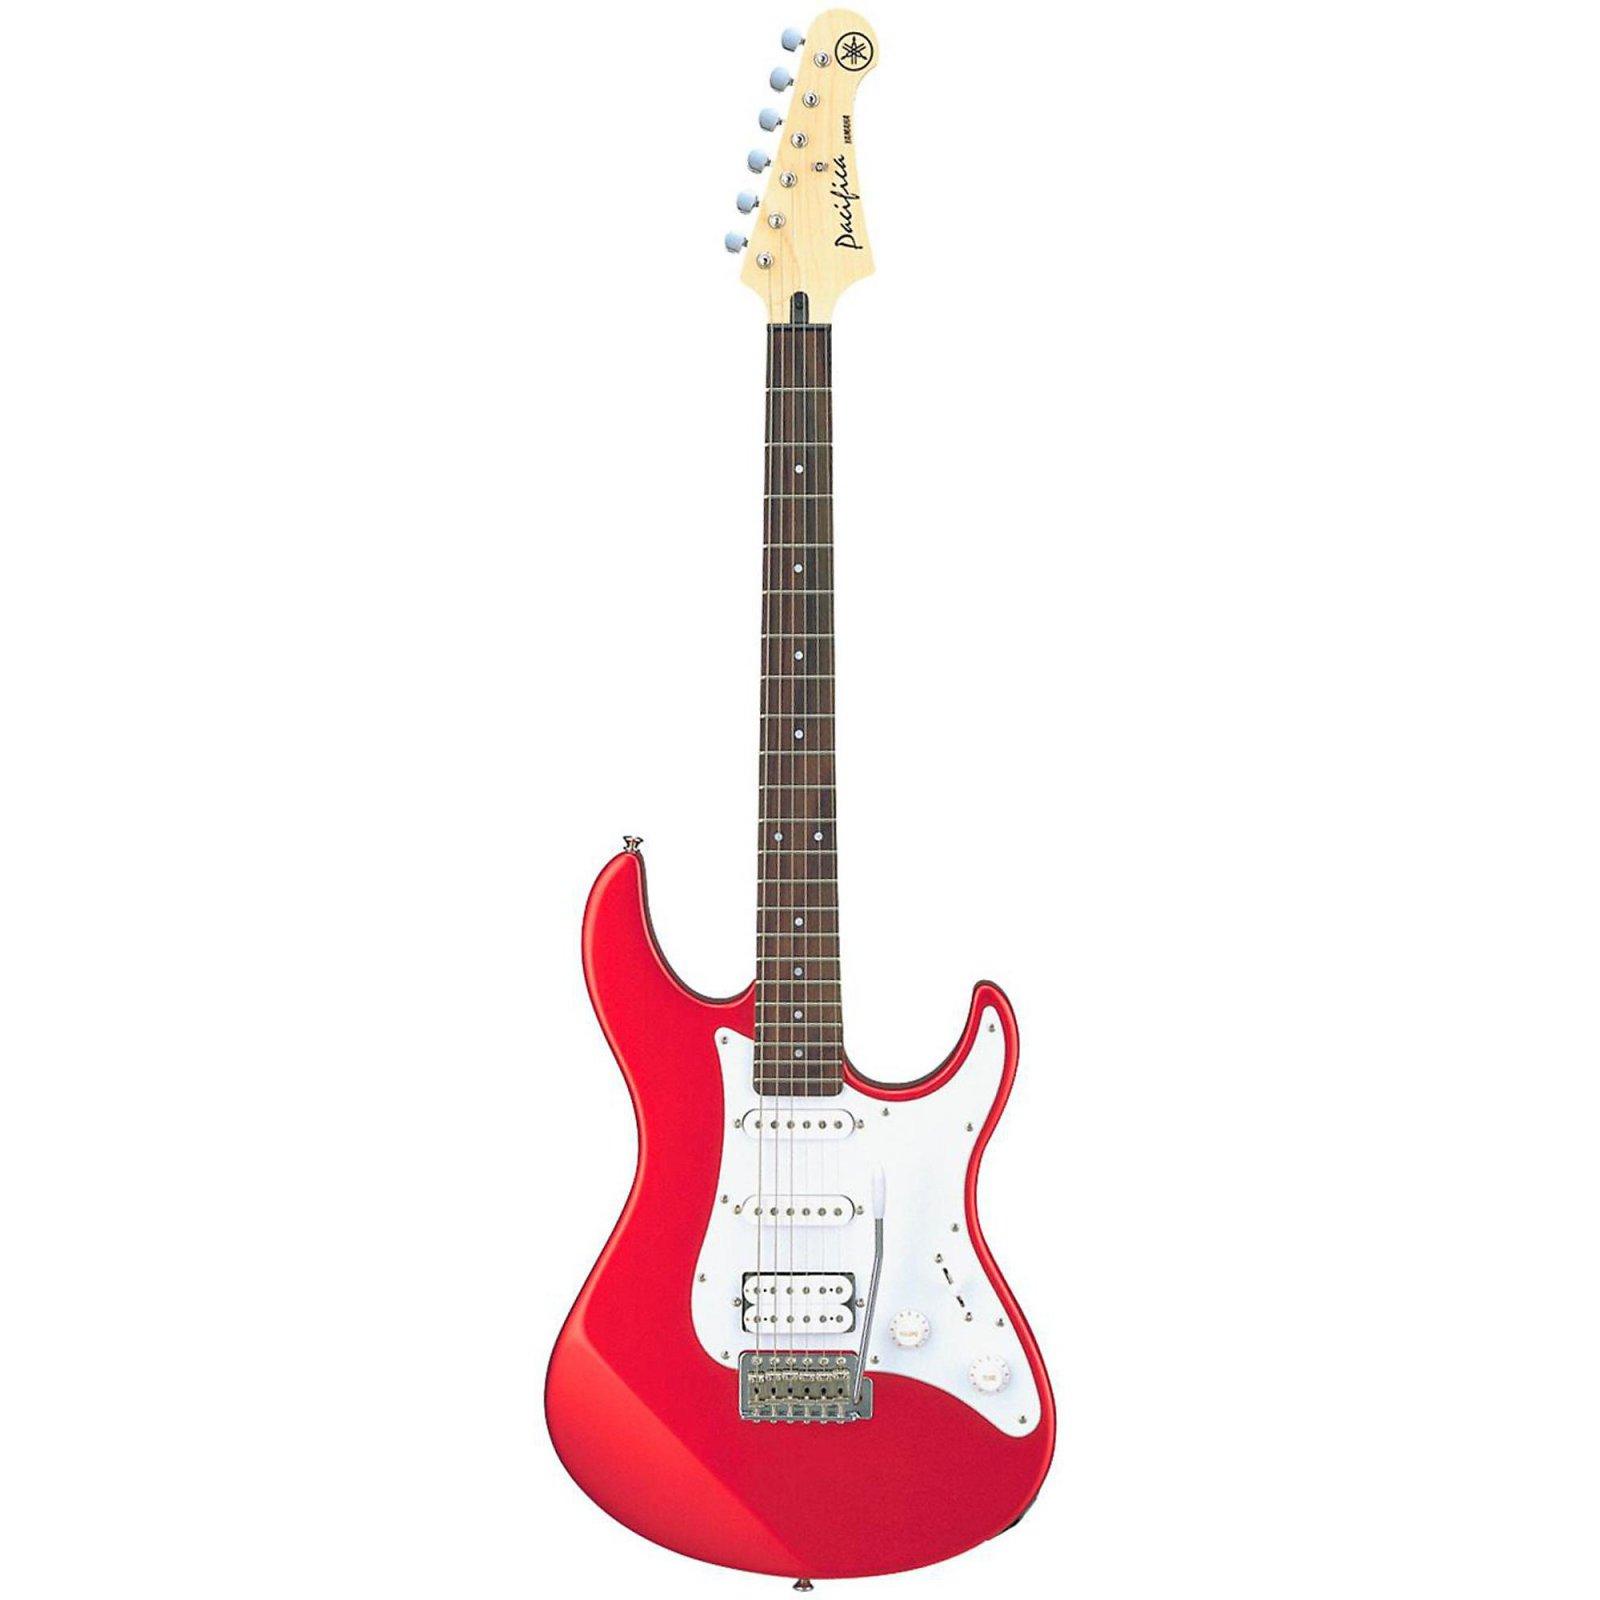 Yamaha Pacifica Electric Guitar w/Agathis Body, Maple Bolt-On Neck, Sonokeling FB, 1 Humbucking/2 Single Coil PU w/Tremolo Bar-Metallic Red